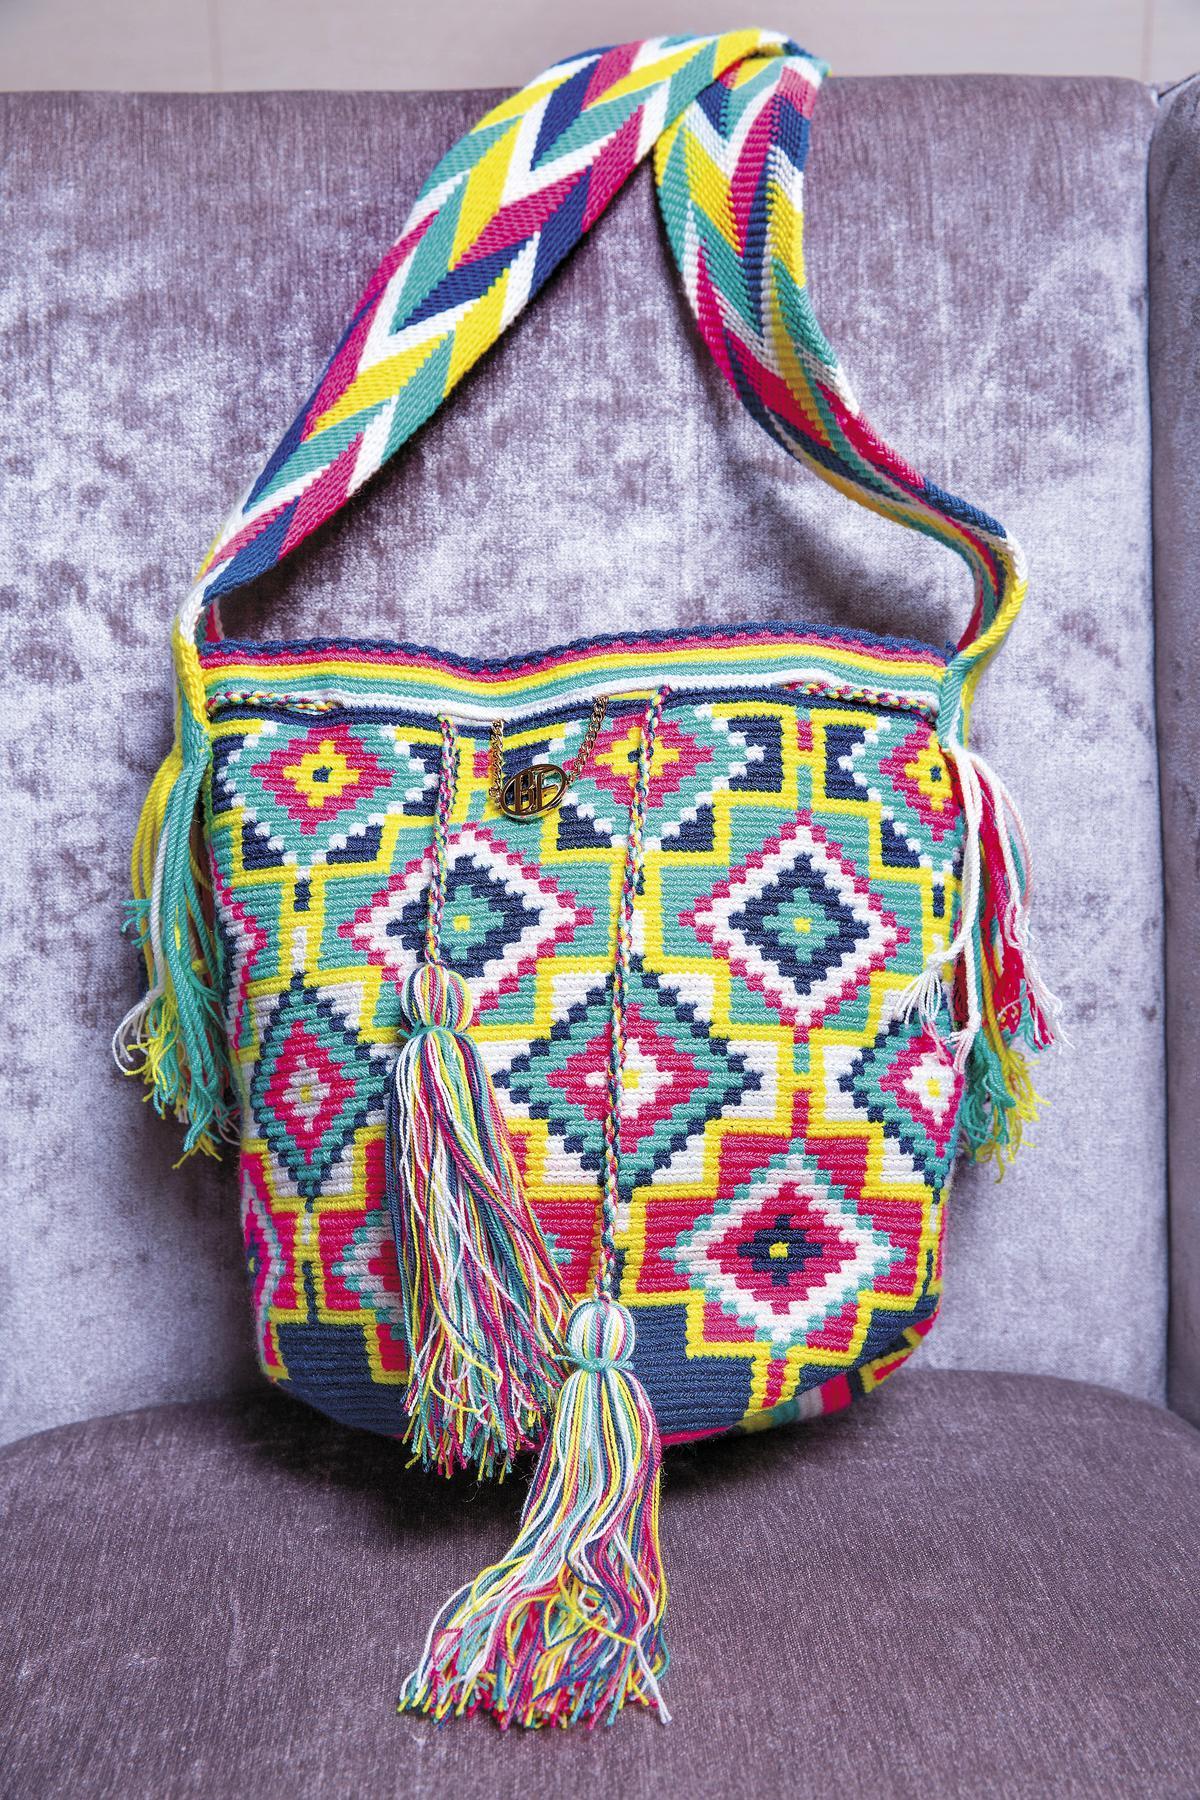 BEING FRONT手工編織包,是朋友送的,但覺得很難駕馭,到目前都還未曾使用過。